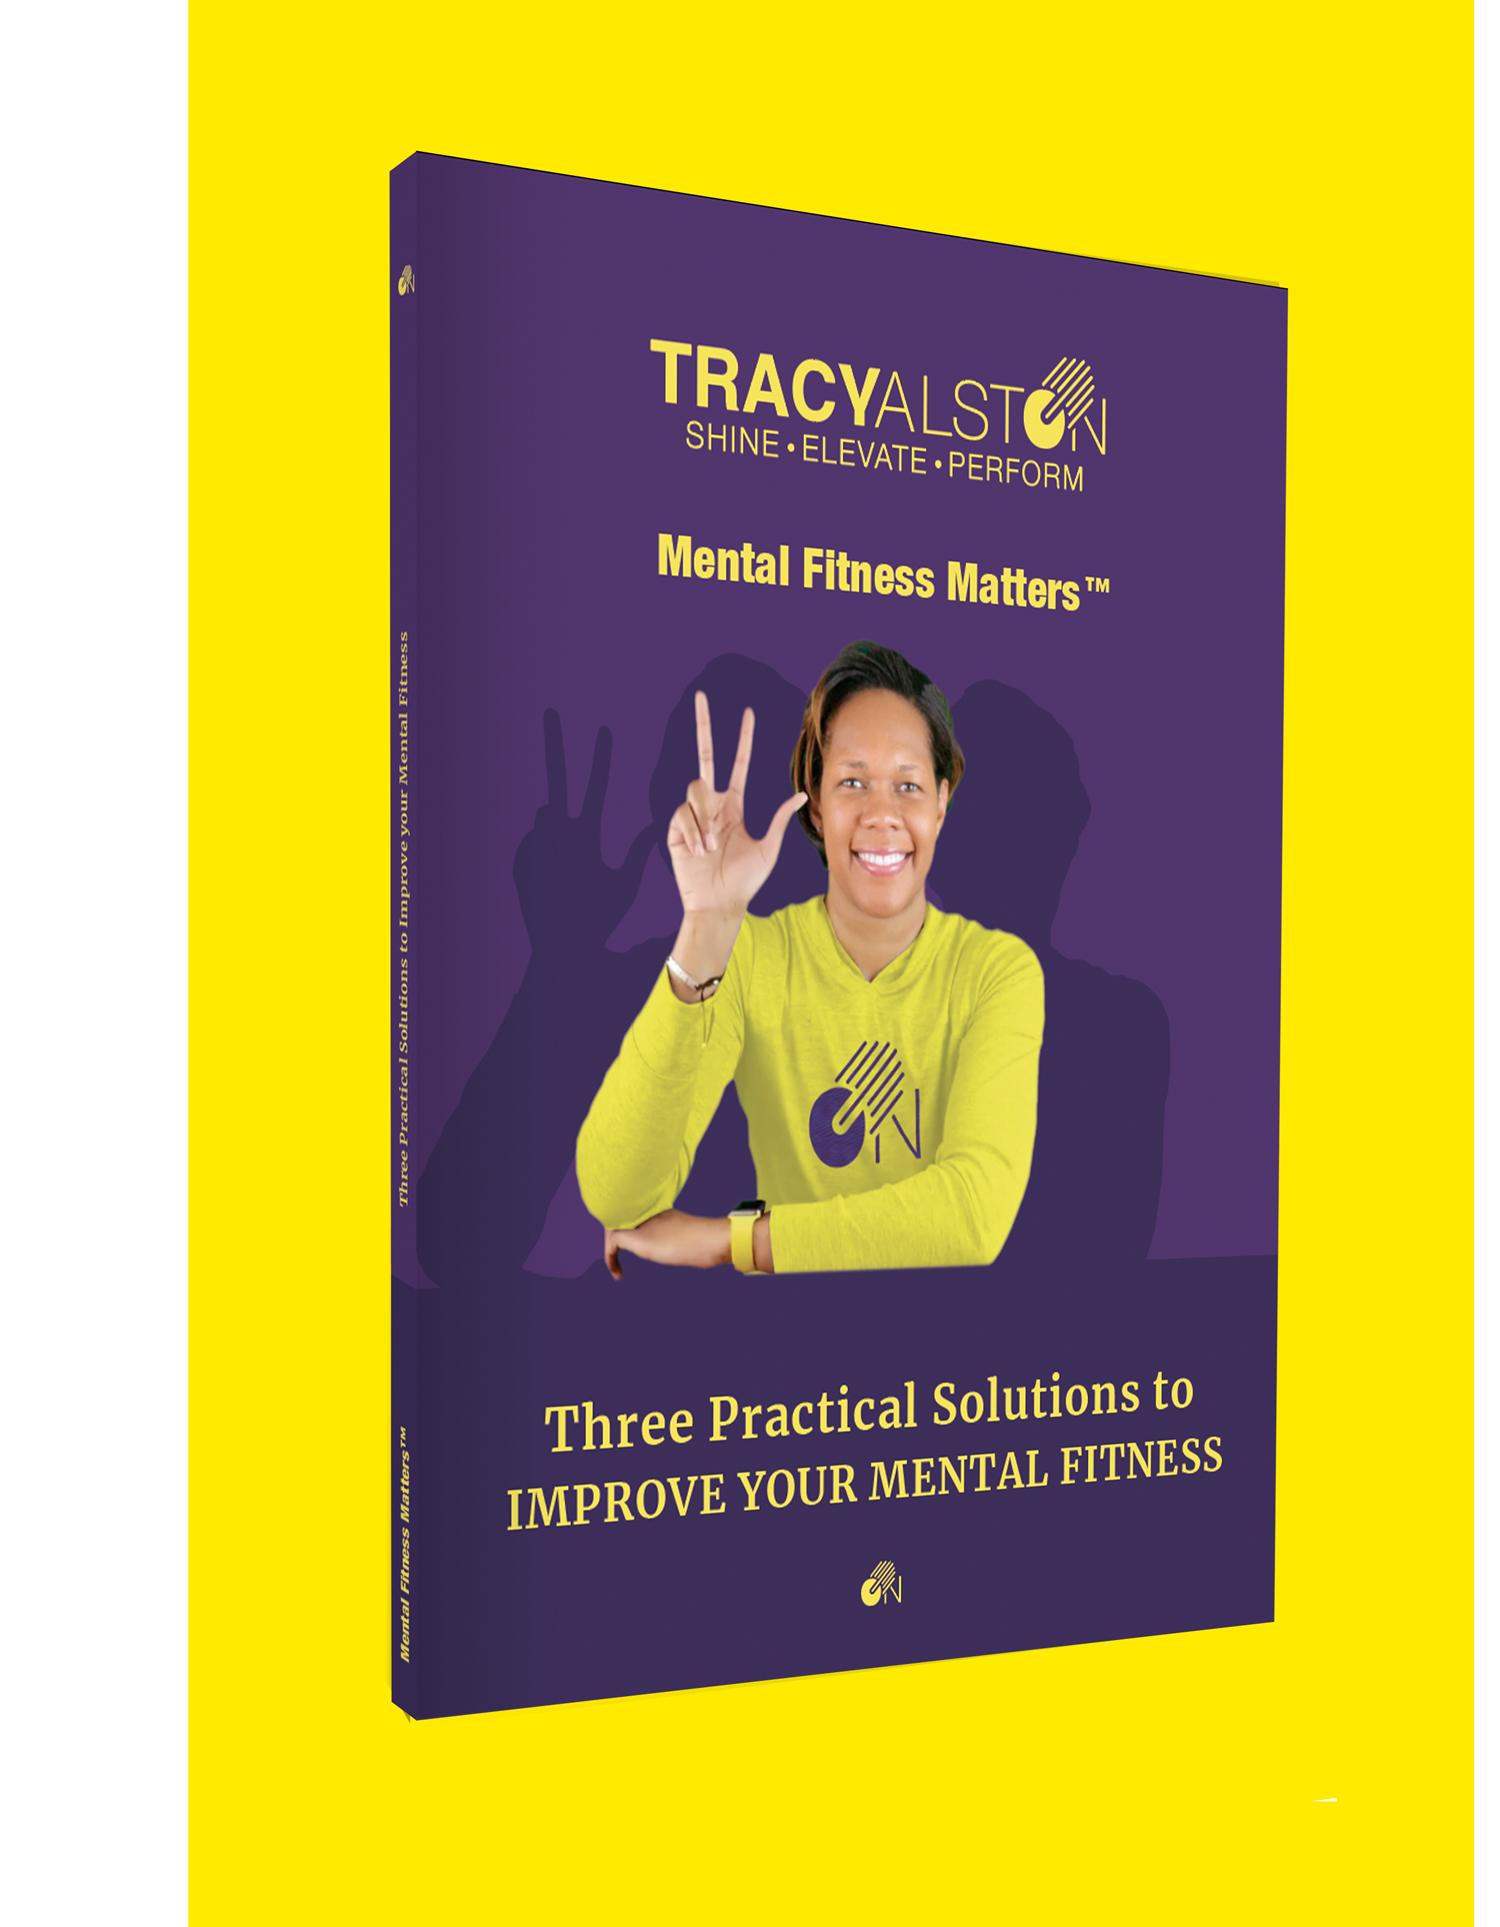 Mental Fitness Matters_Mental Performance Tracyalston.com